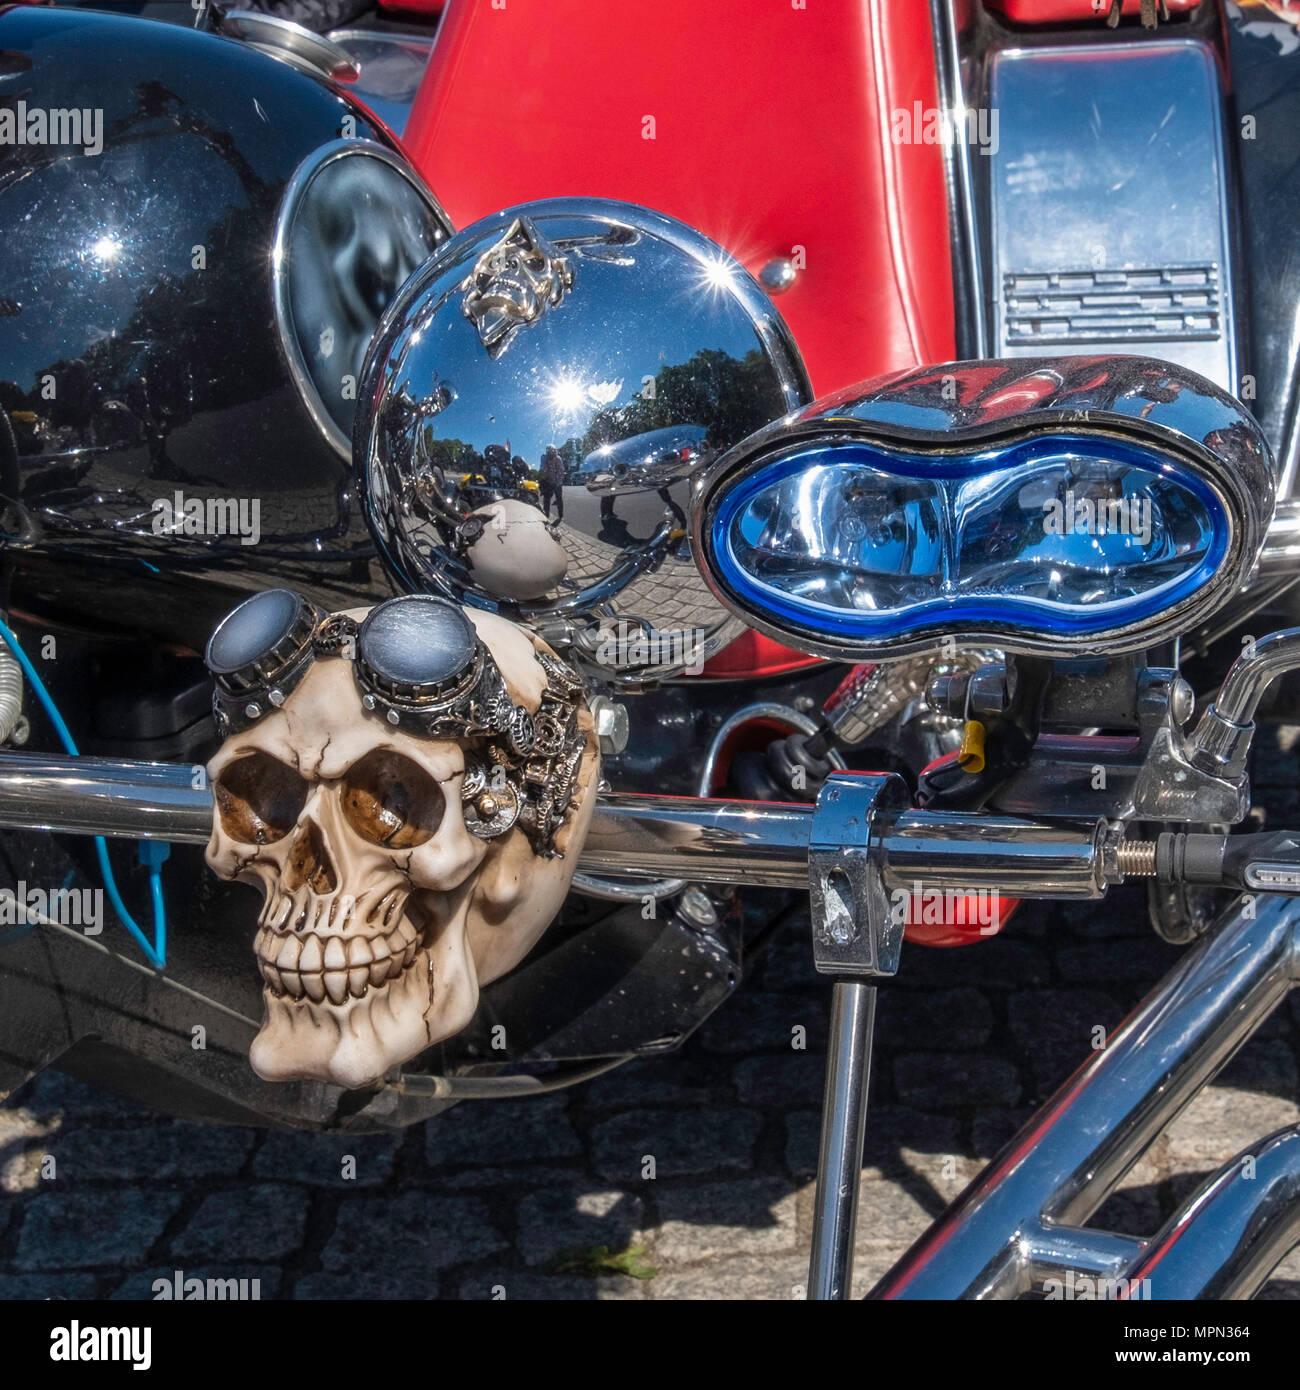 Berlin Mitte, Motor bike detail. Parked bike with skull mascot a at Bikers Demo. - Stock Image